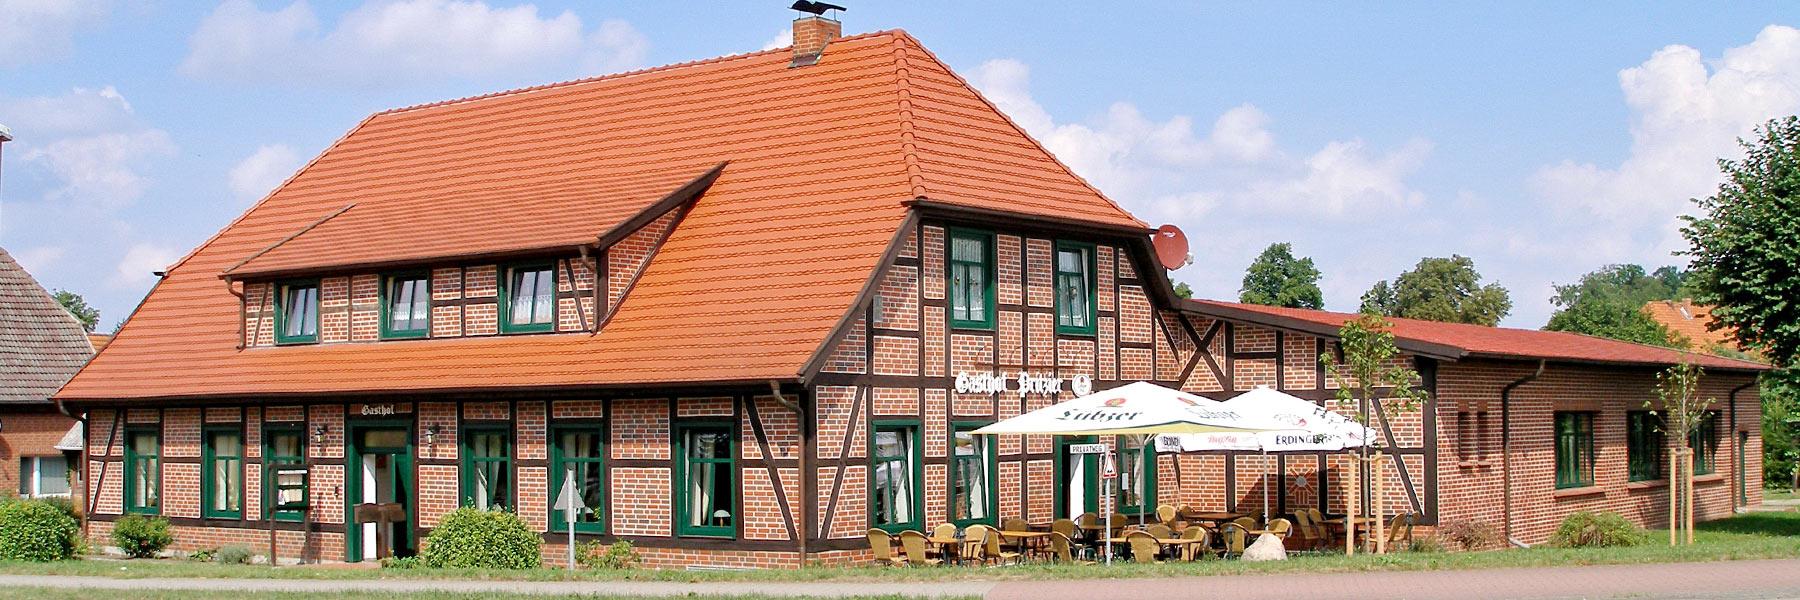 Gutshof - Gasthof Pritzier